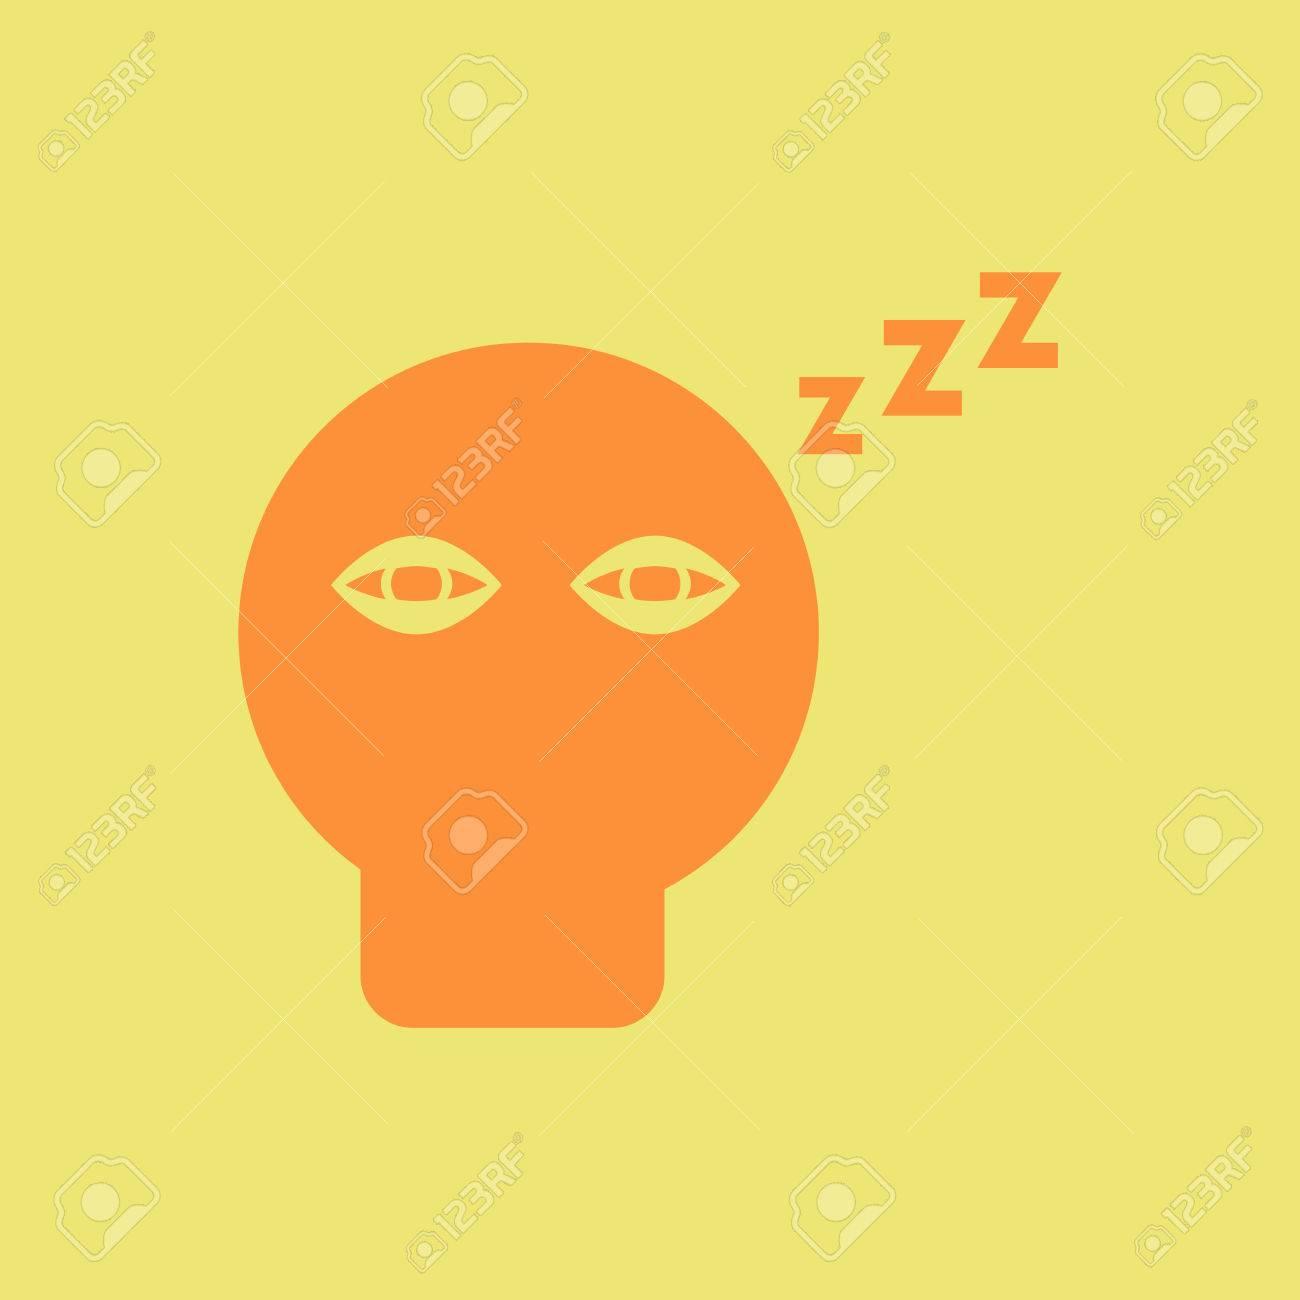 insomnia, various symptoms of leukemia fatigue royalty free clipartsinsomnia, various symptoms of leukemia fatigue stock vector 69287804